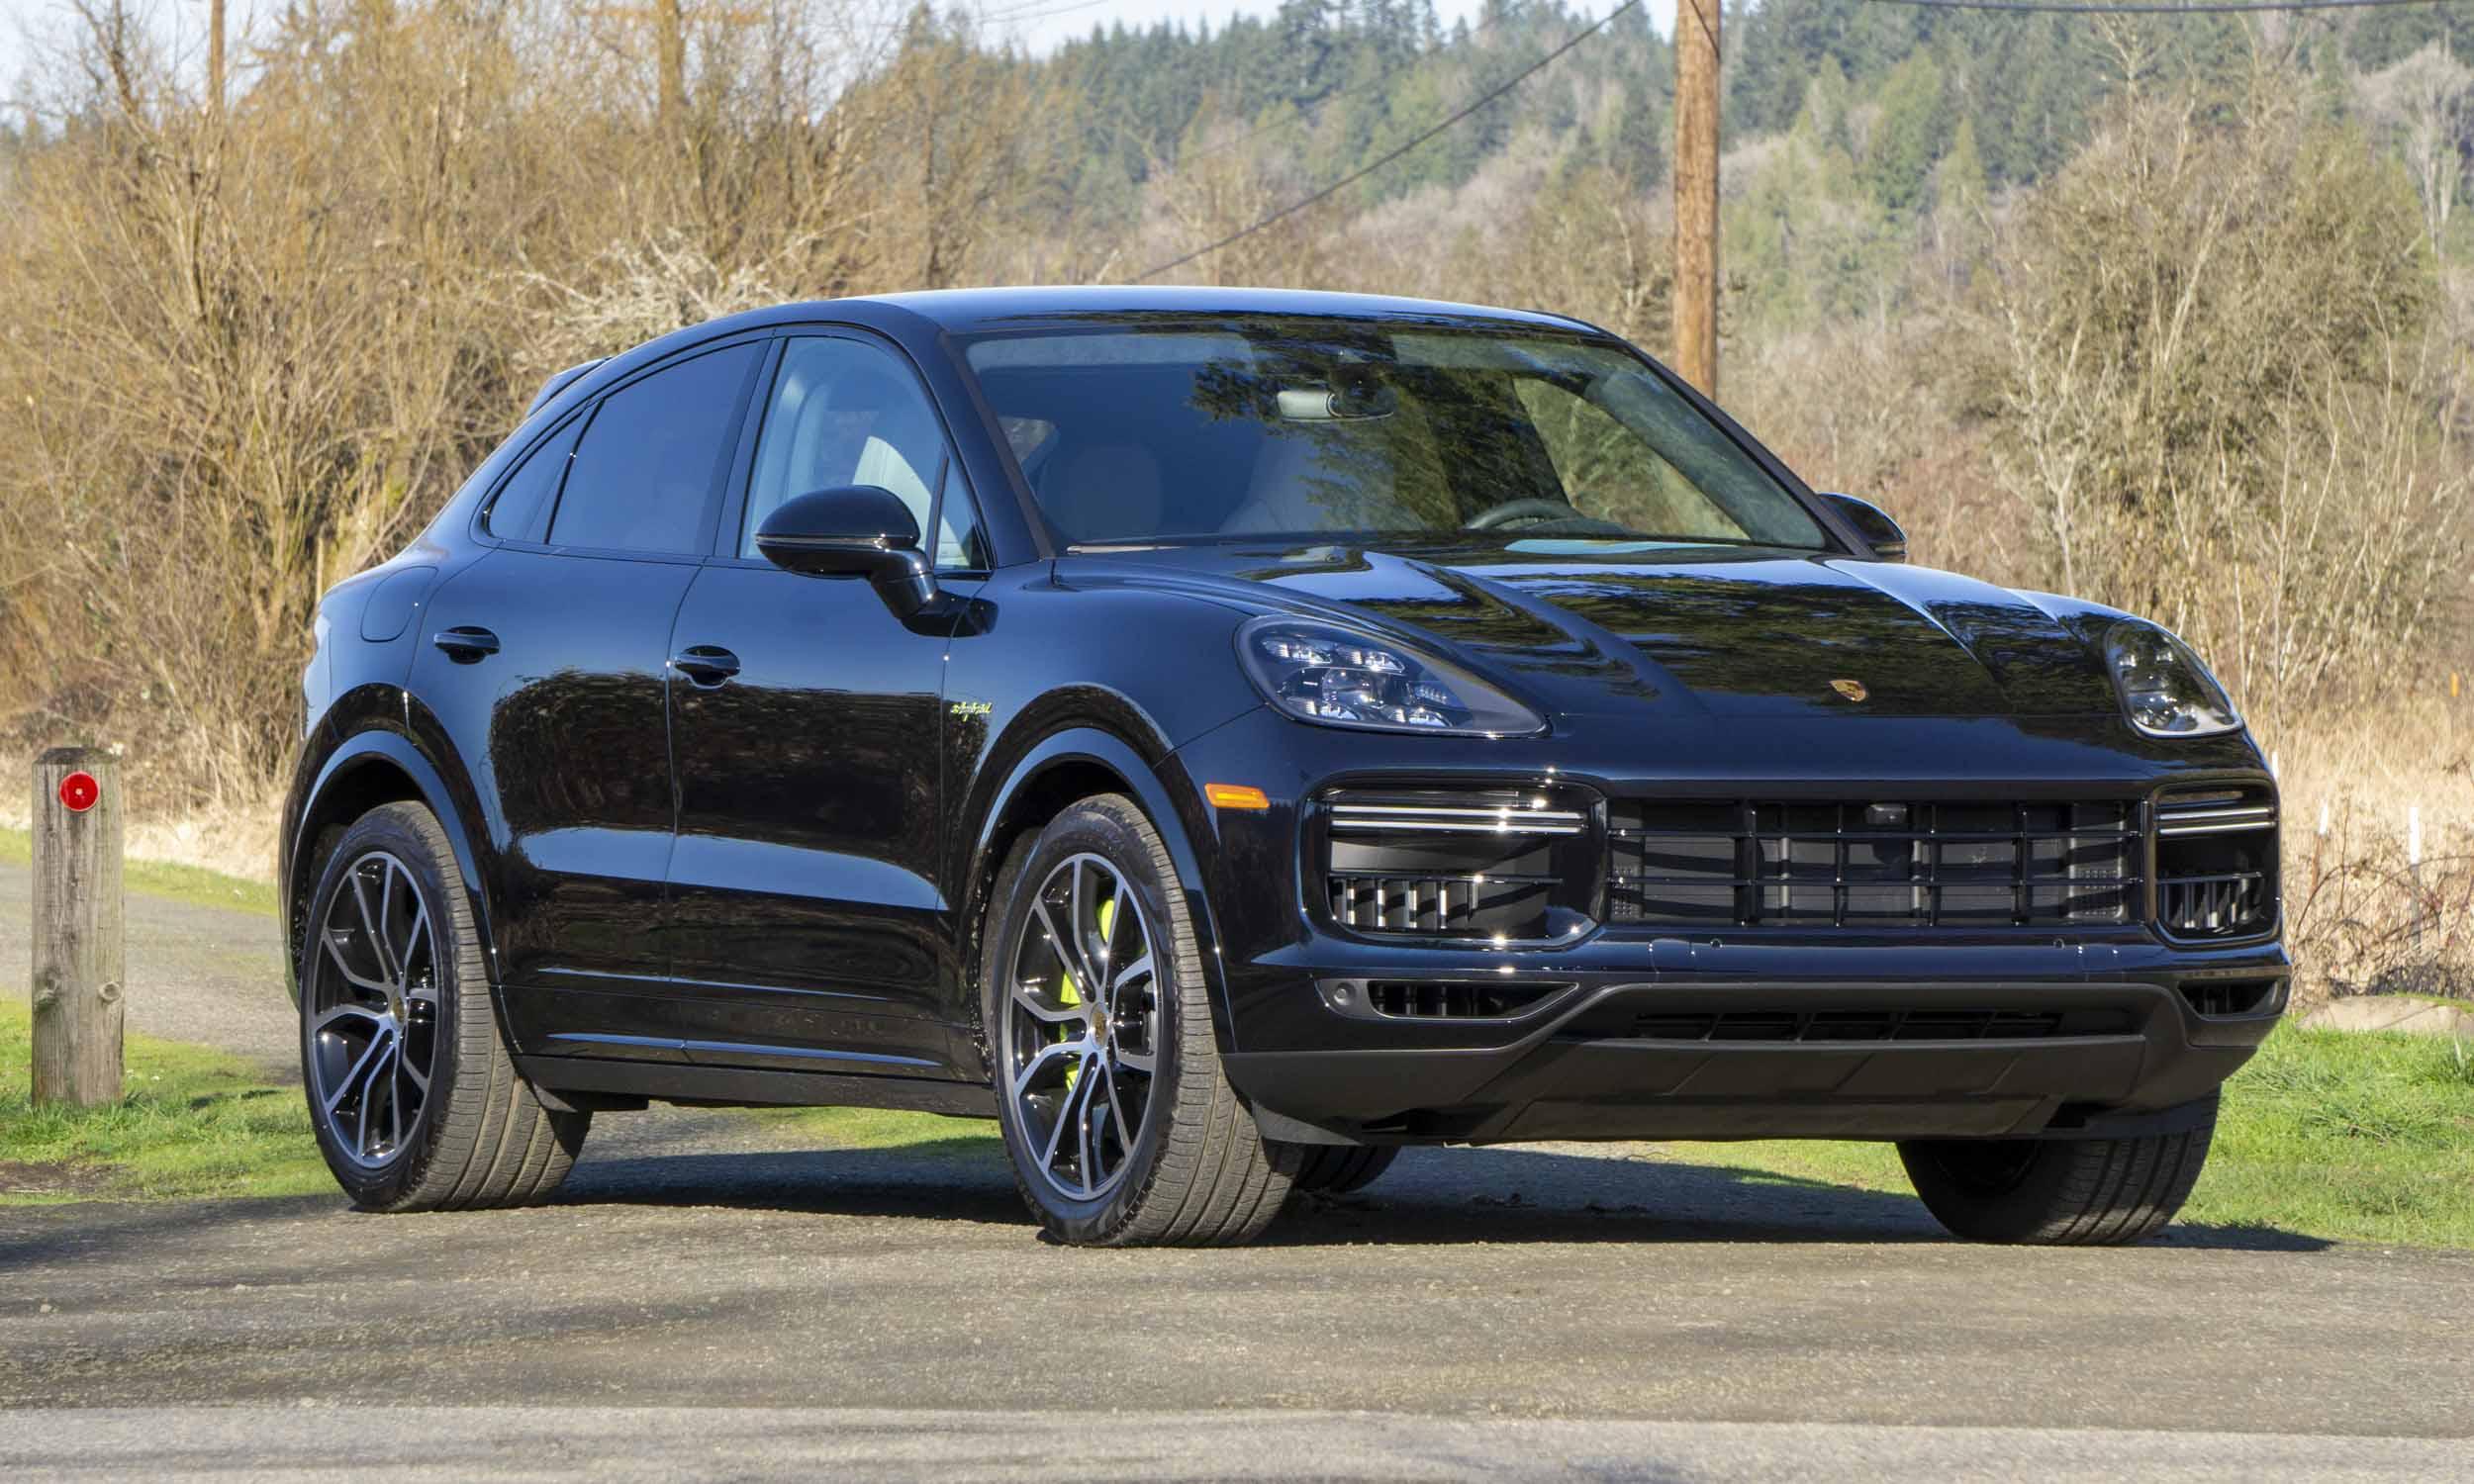 2020 Porsche Cayenne Turbo S E Hybrid Coupe Review Autonxt